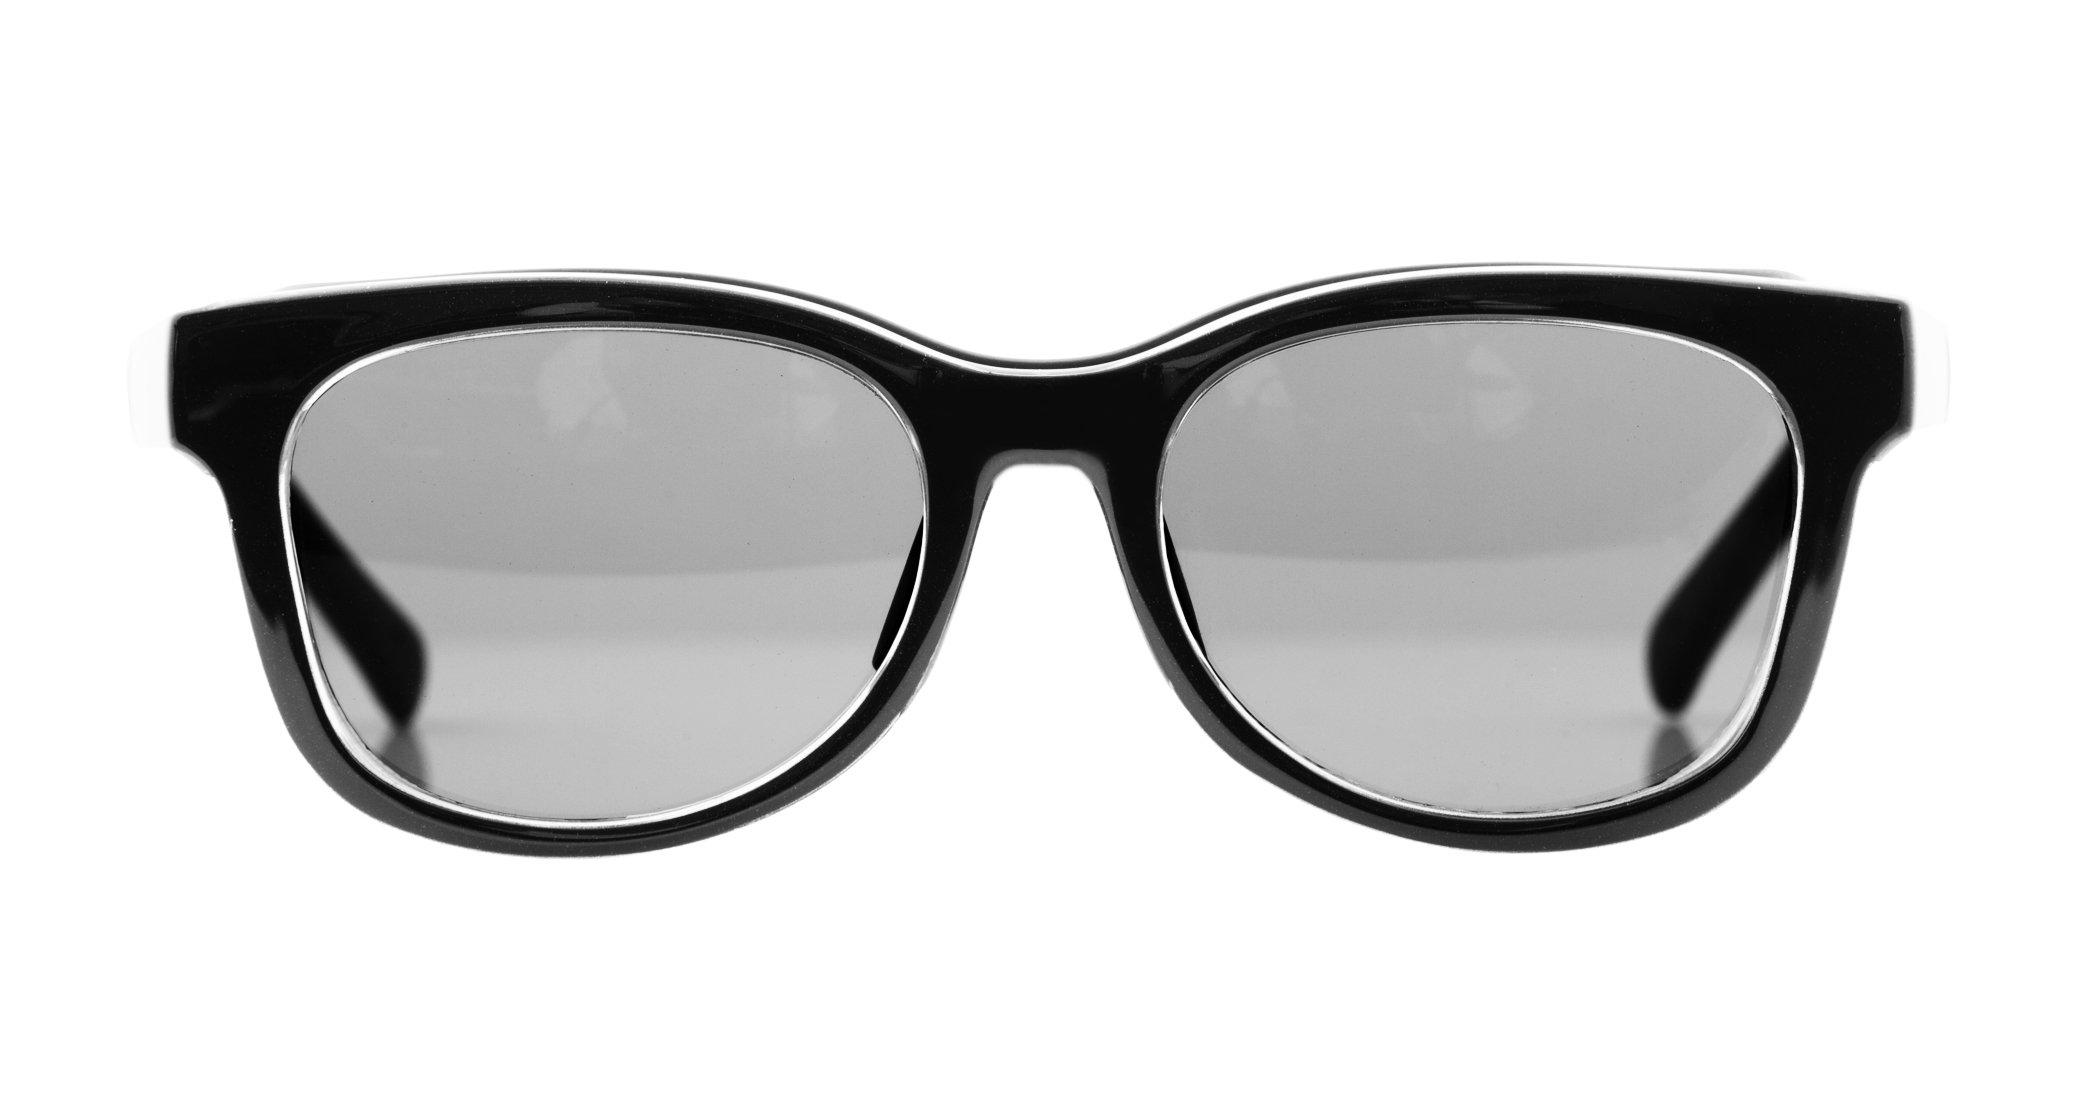 Childrens Protective Sunglasses (Black)